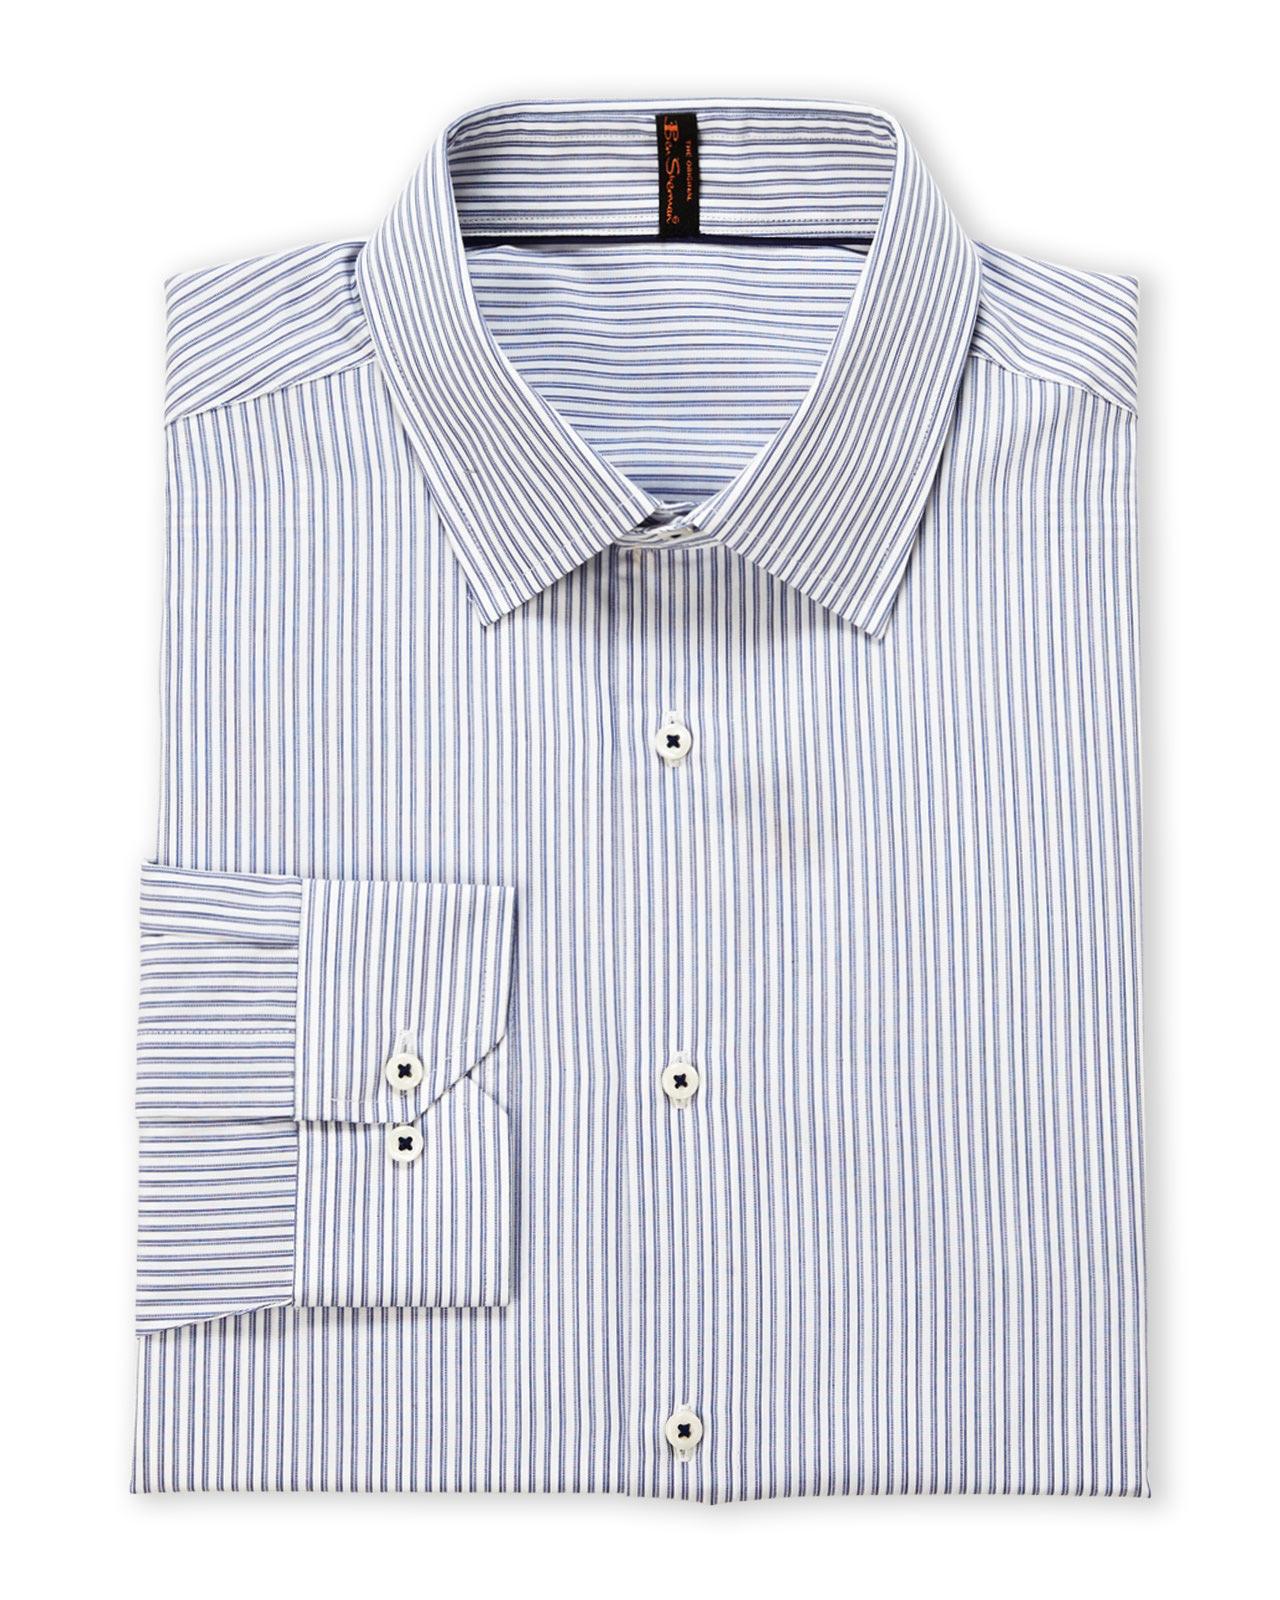 Ben sherman blue white stripe super slim fit dress shirt for Super slim dress shirts